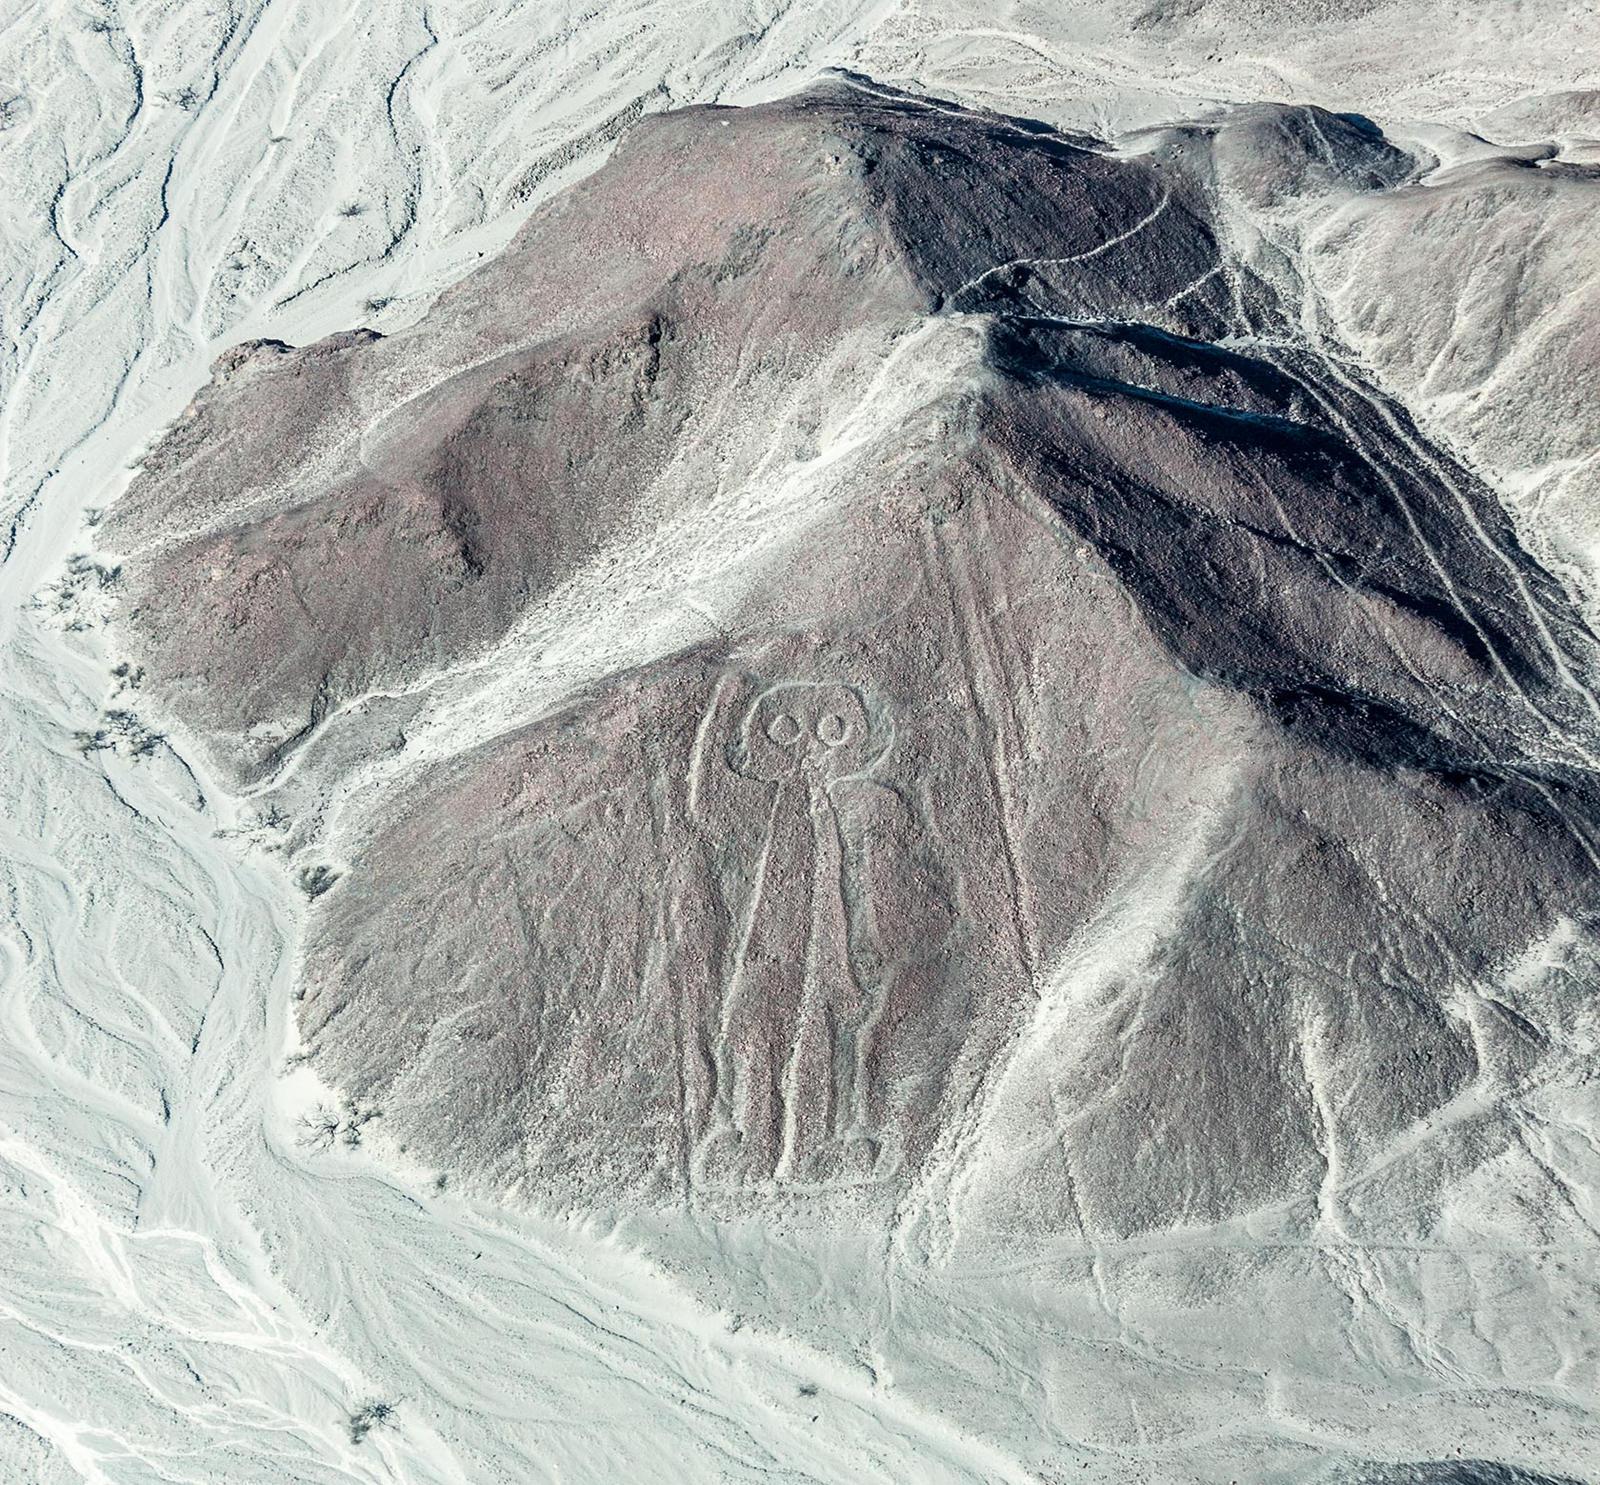 Nazca - The Astronaut